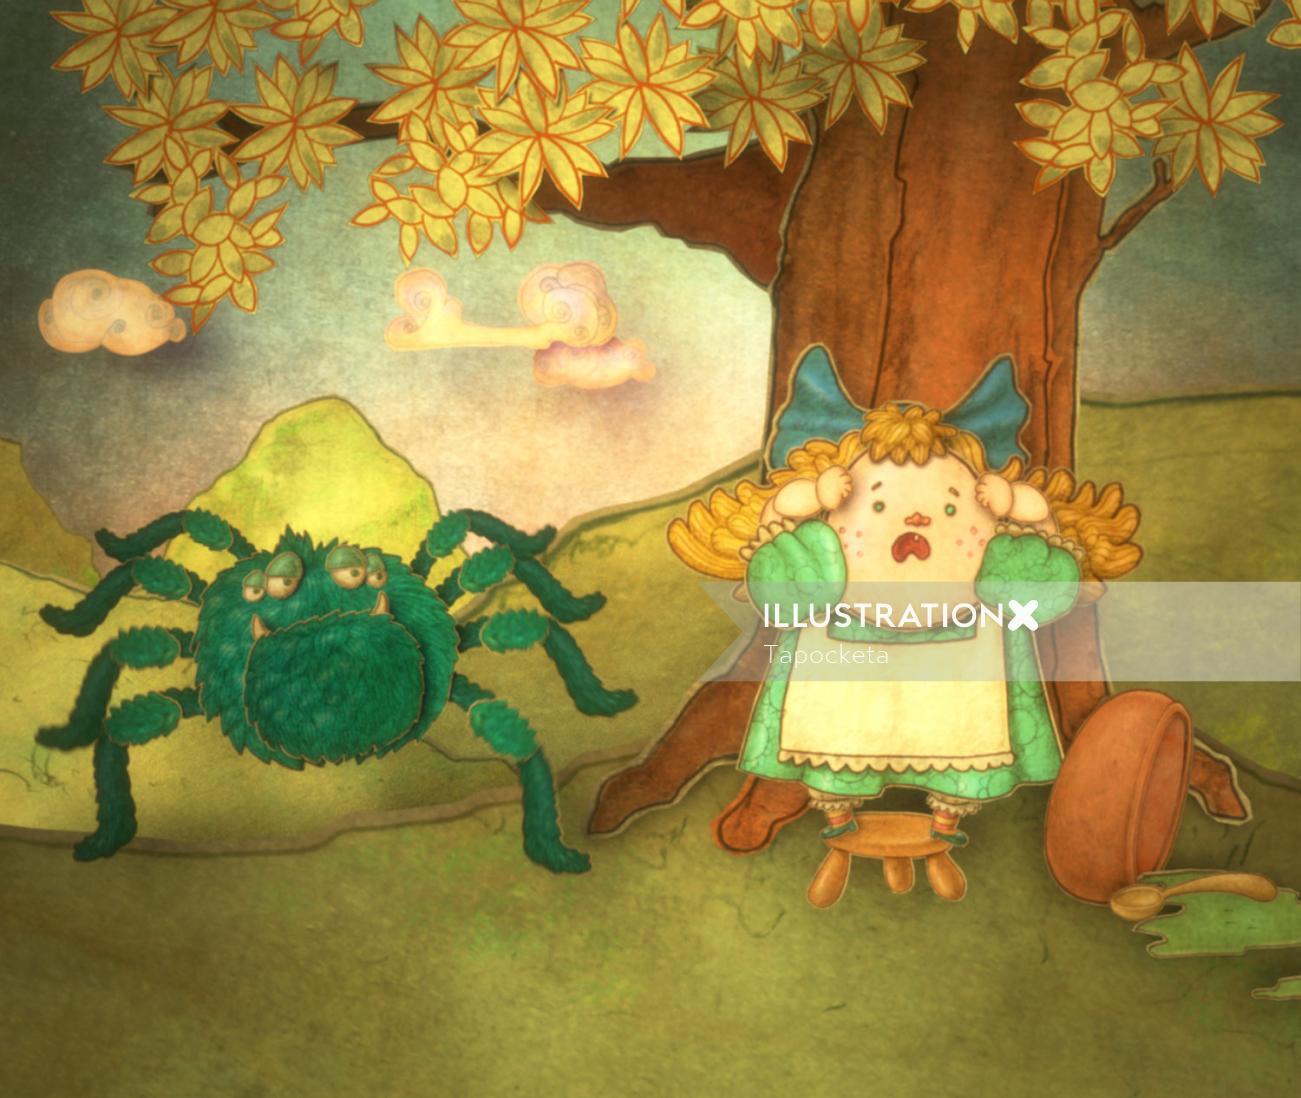 Little Miss Muffett, the nursery rhyme character drawing